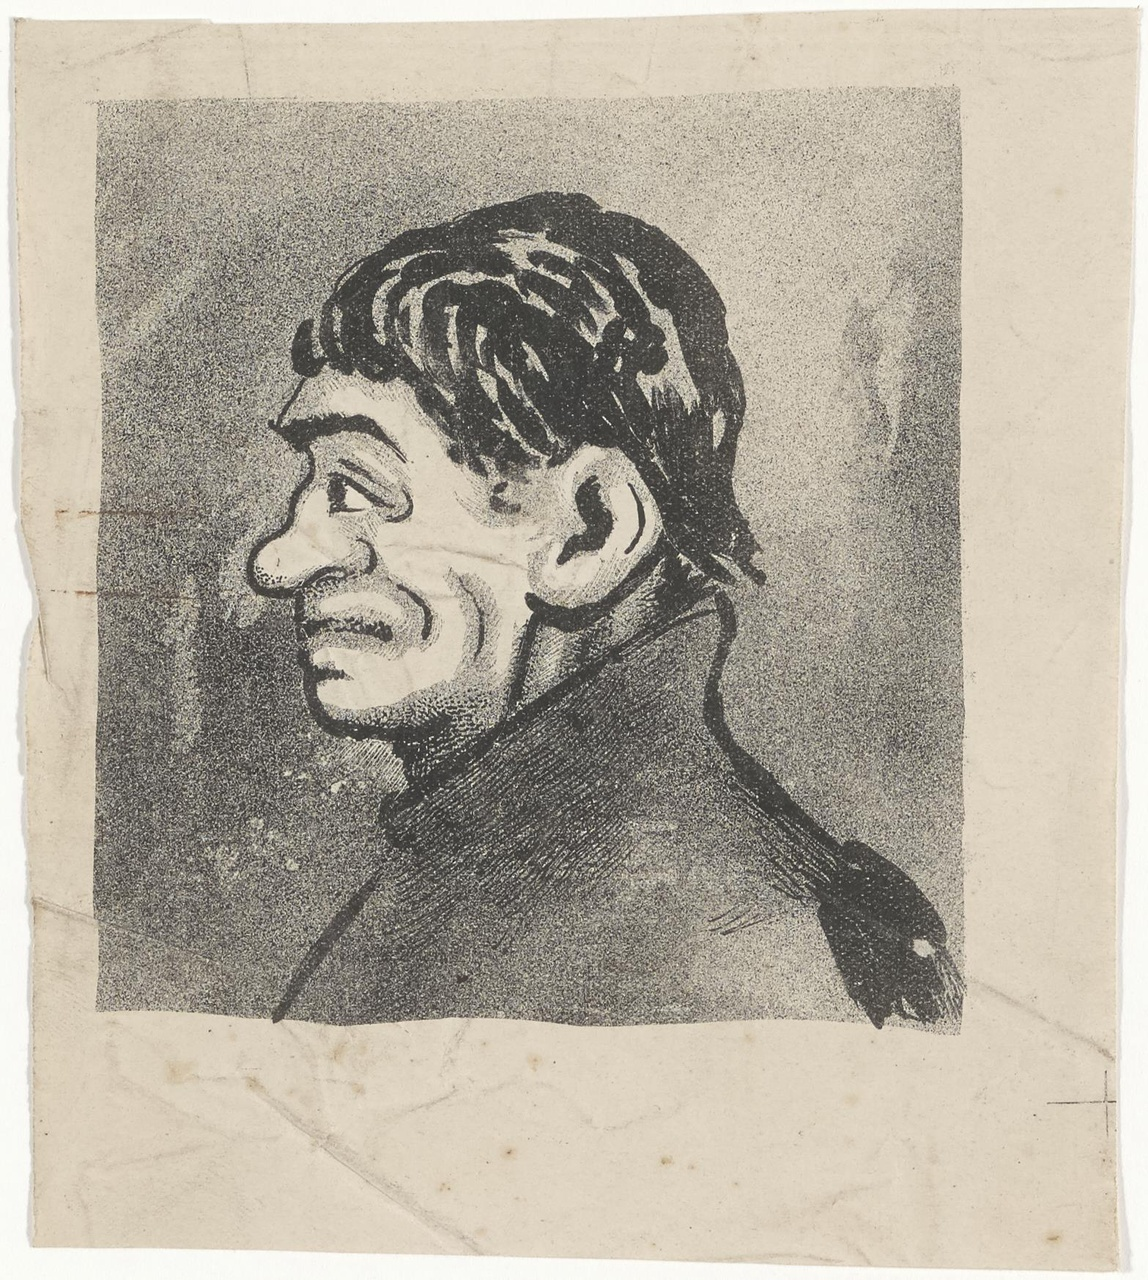 Karikaturaal portret en profil